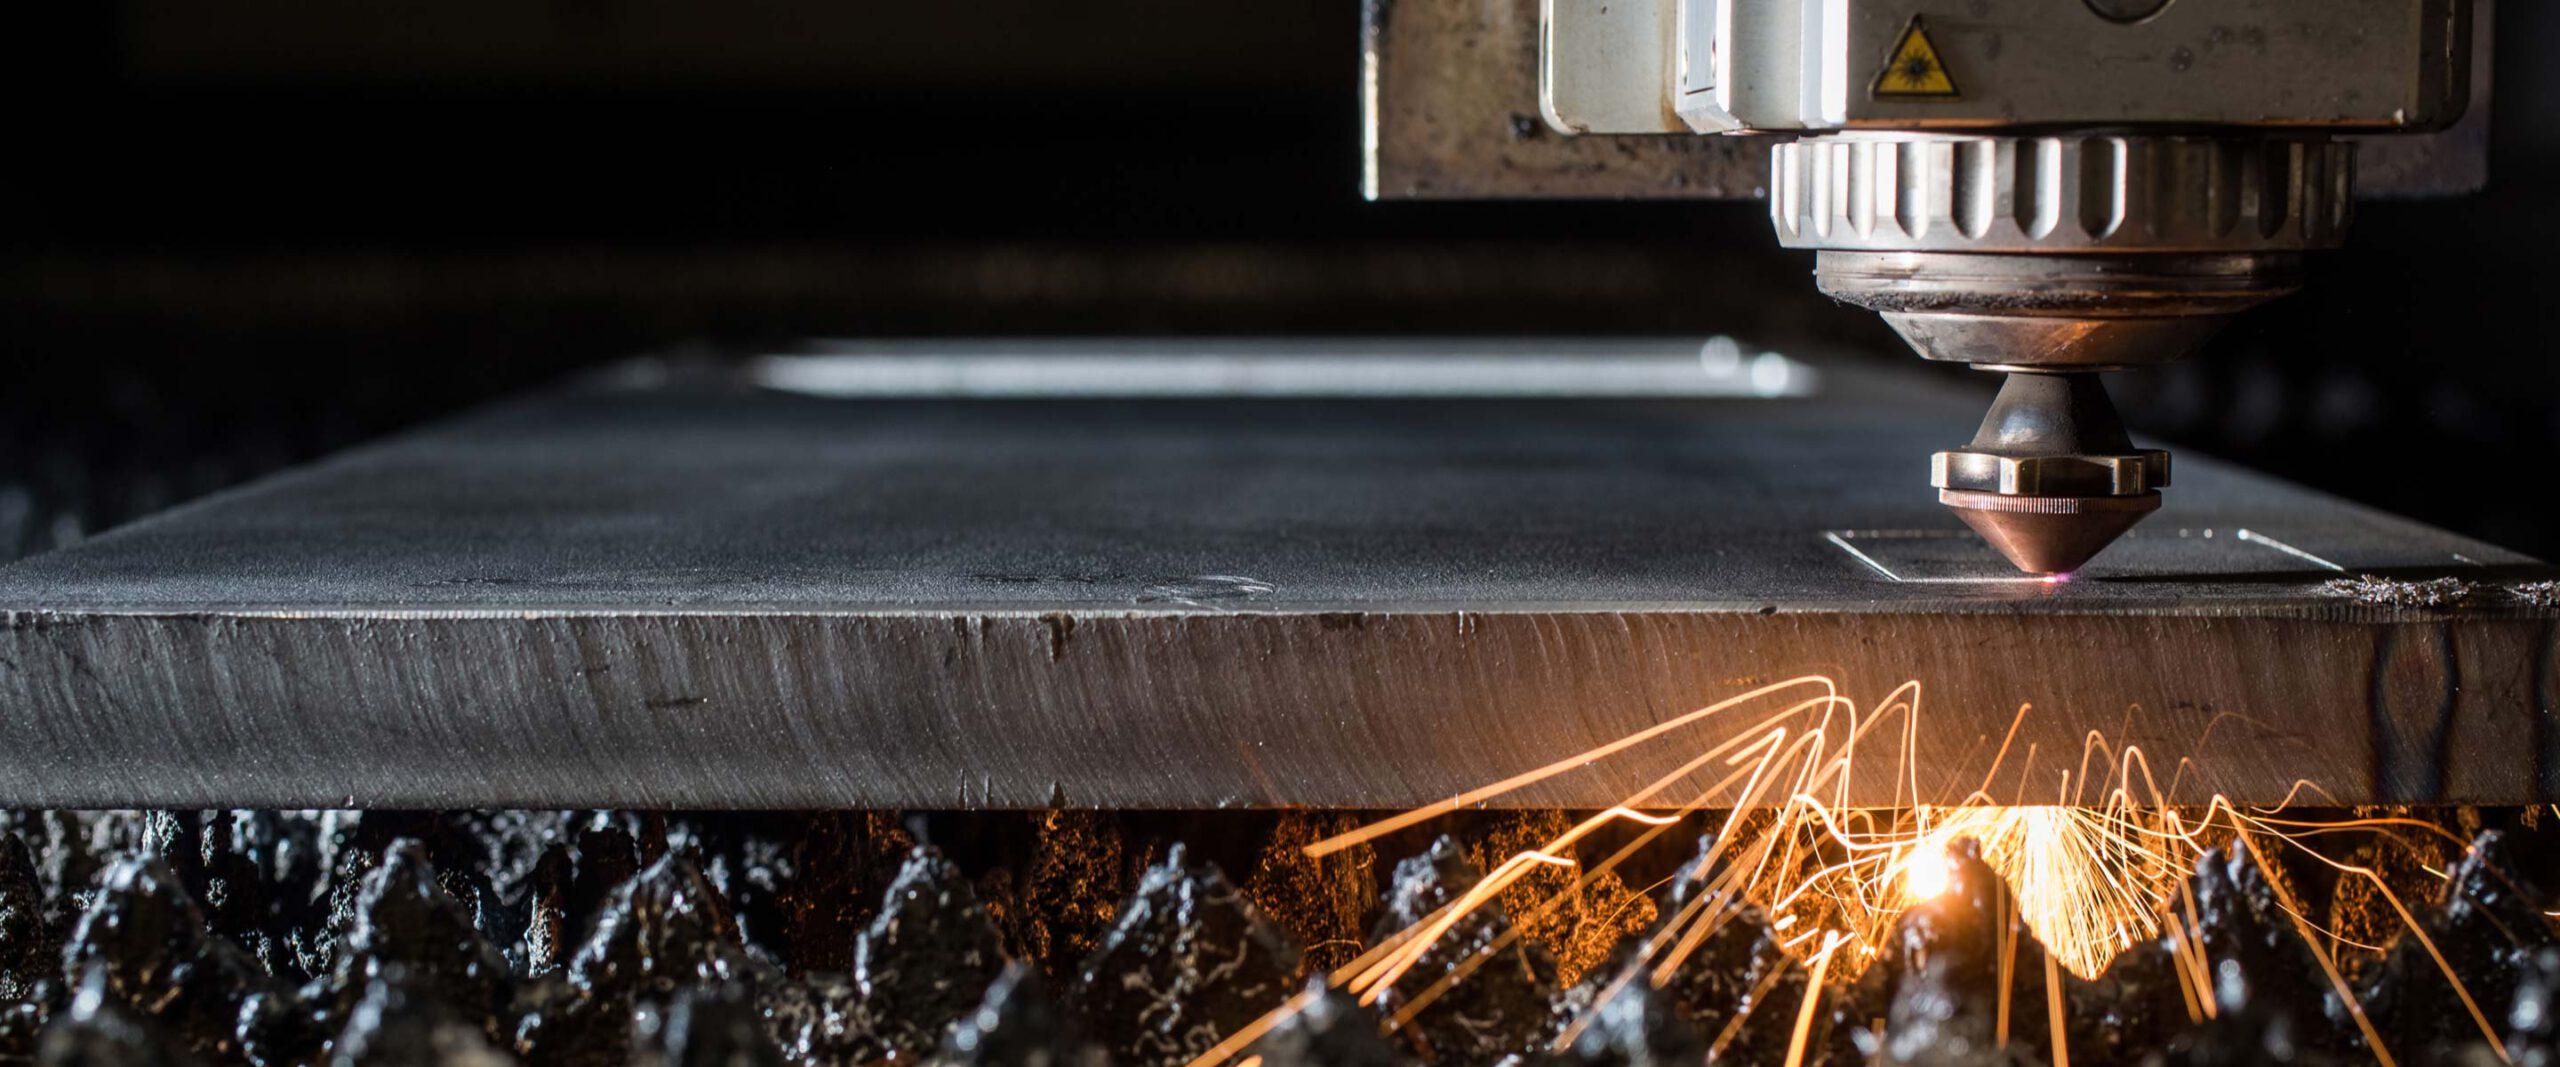 Metallbearbeitung LKM Anfrageformular